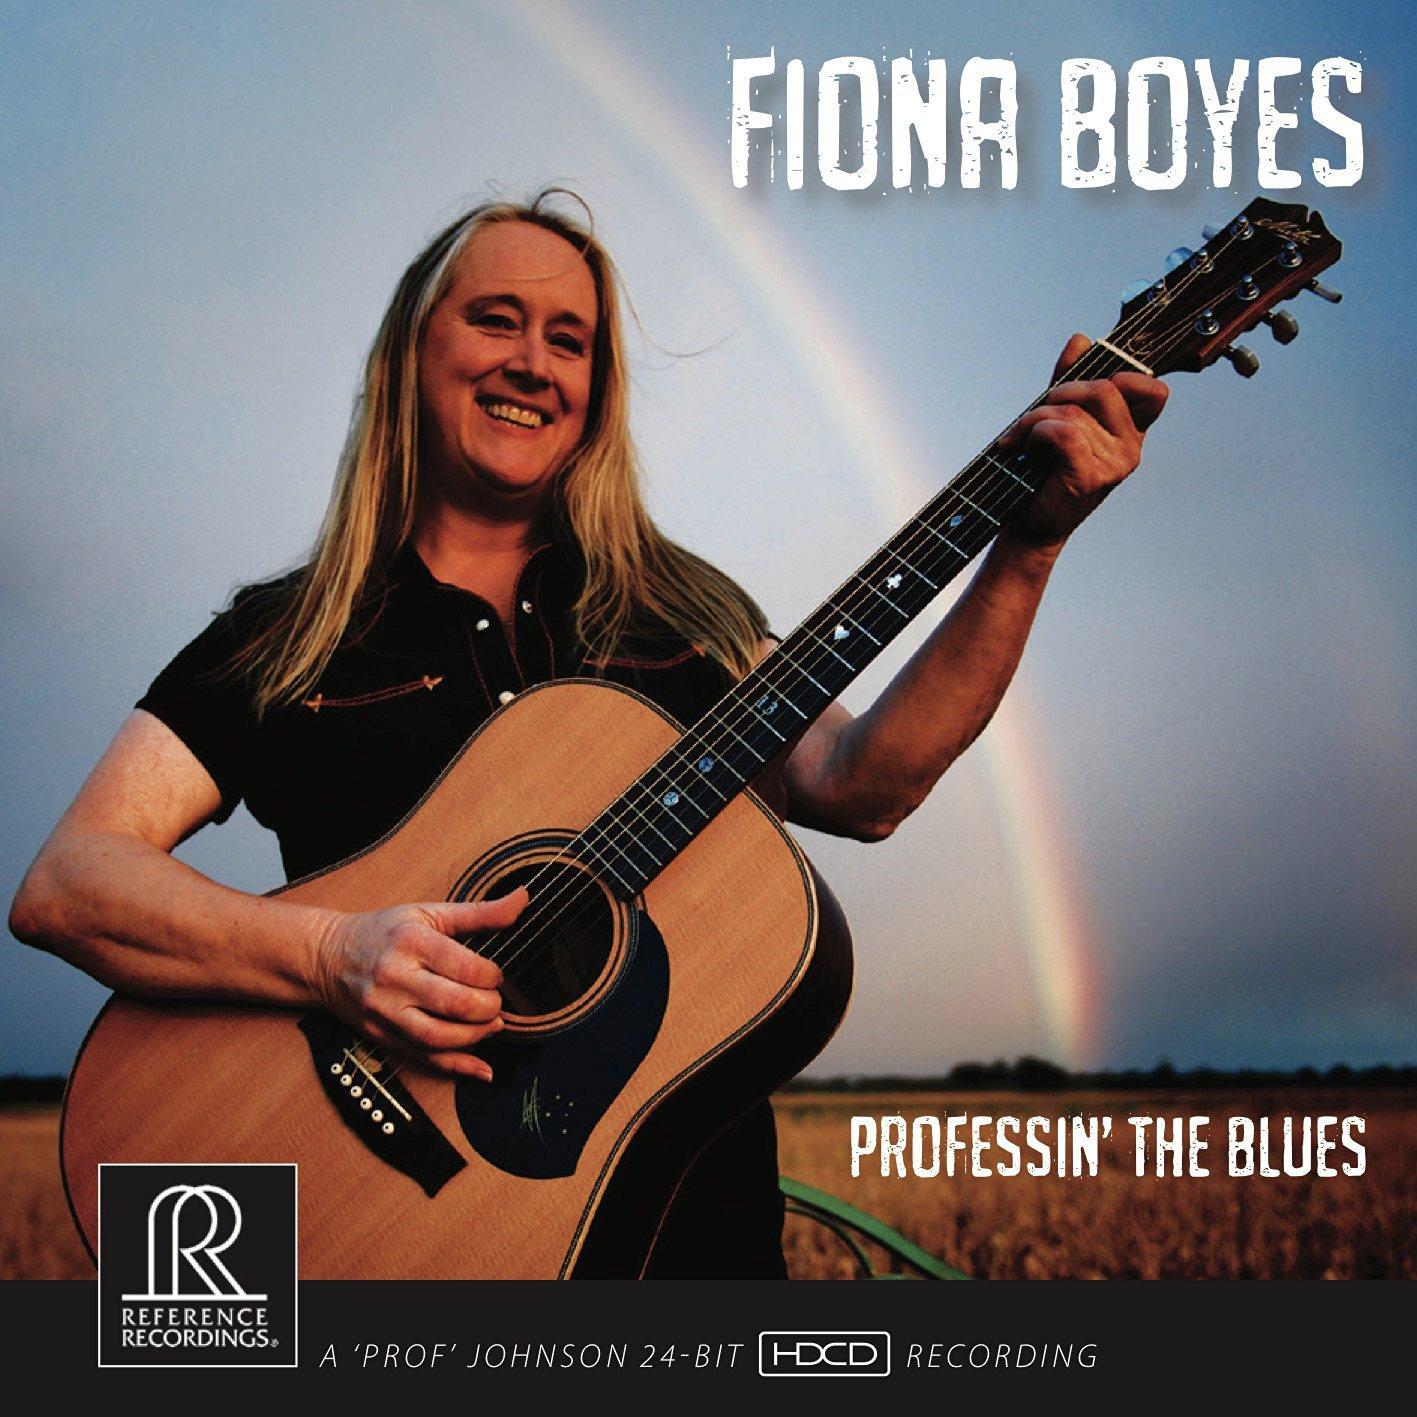 Fiona Boyes - Boyes:professin' The Blues [fiona Boyes] [reference Recordings: Rr-140]